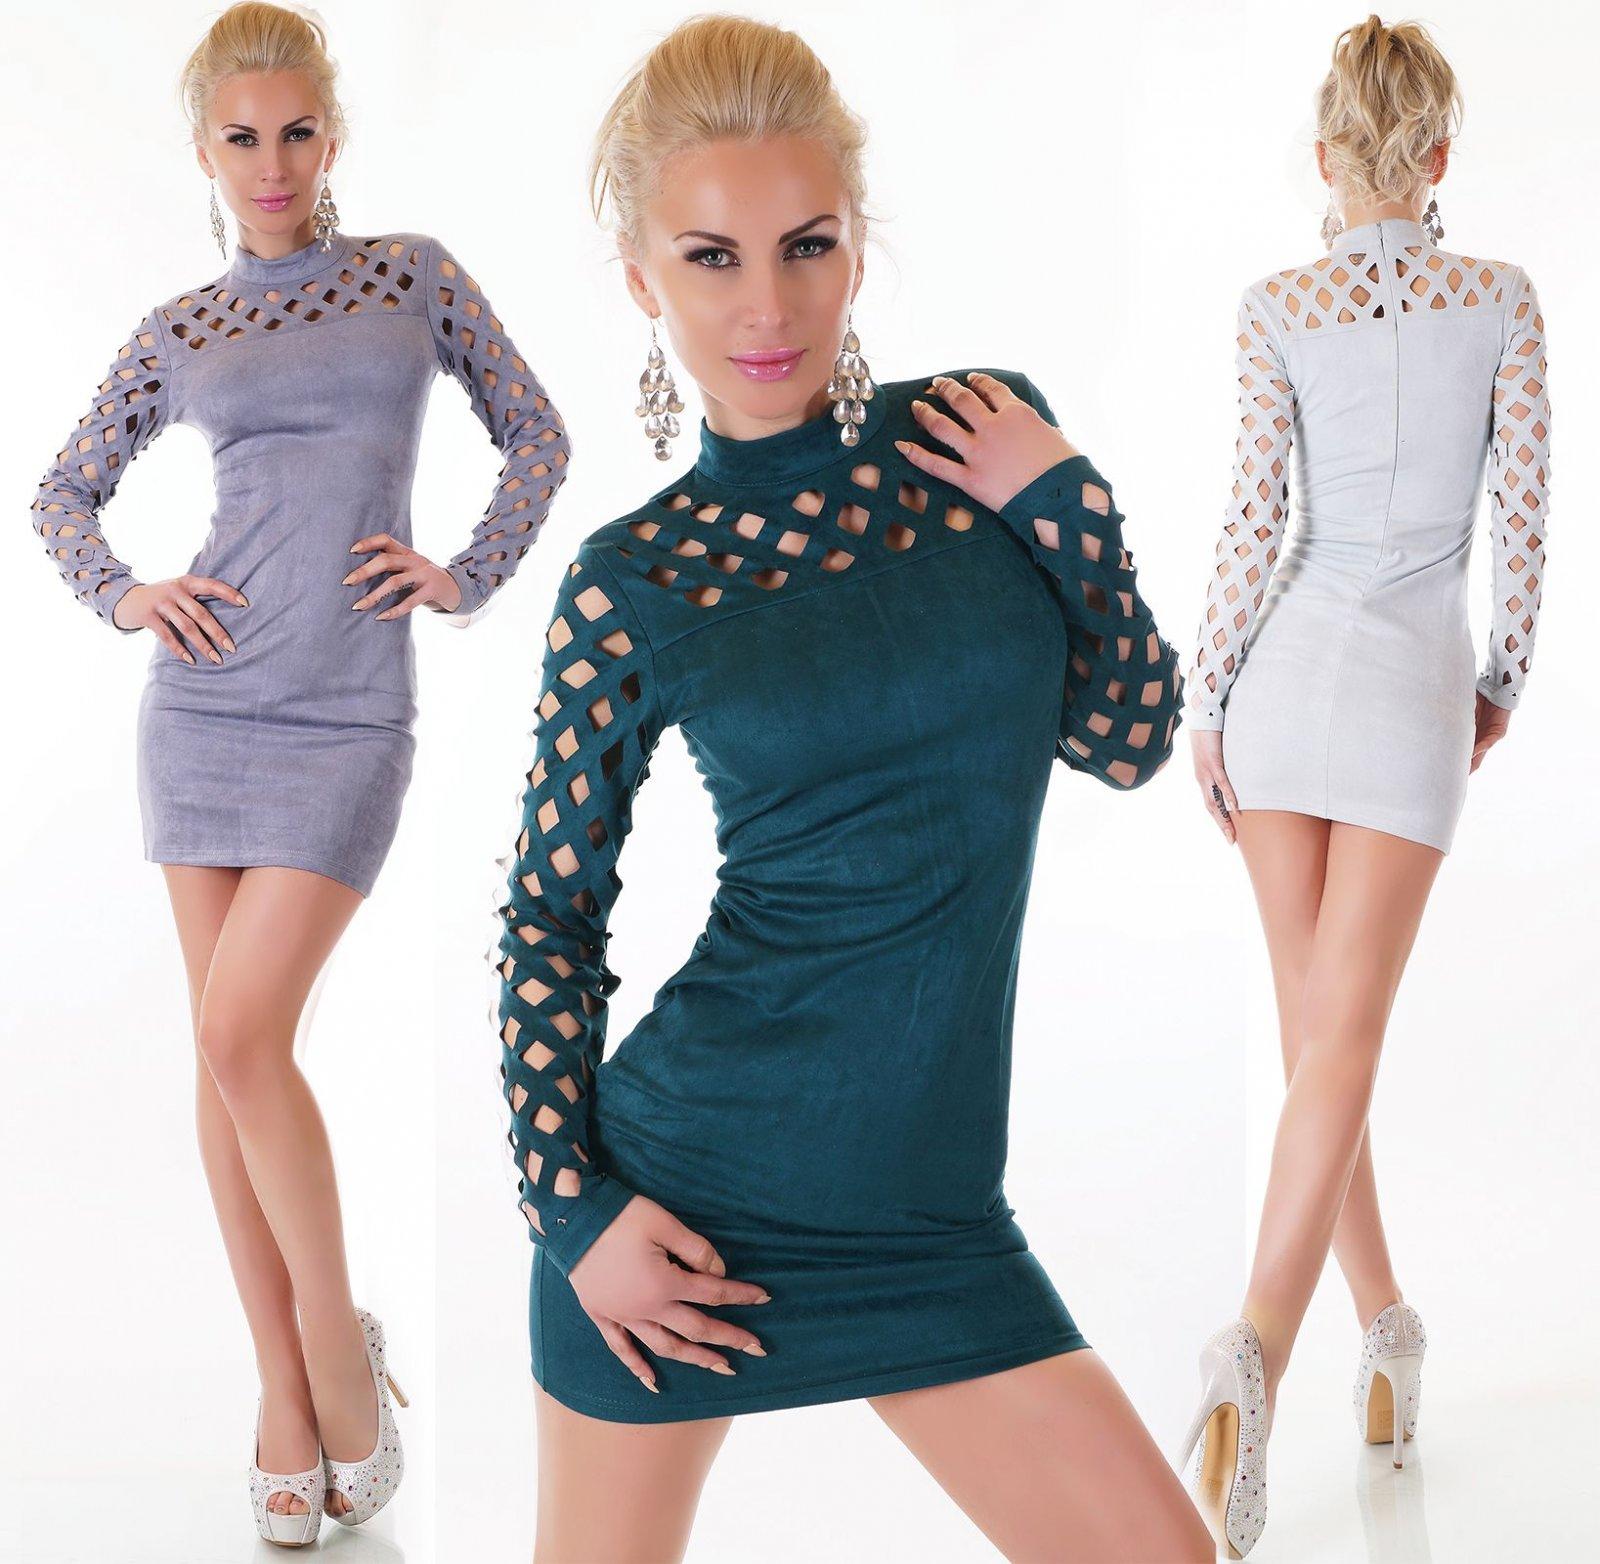 Damen Figurbetontes Kleid Minikleid Stretch Langarm Velour Material